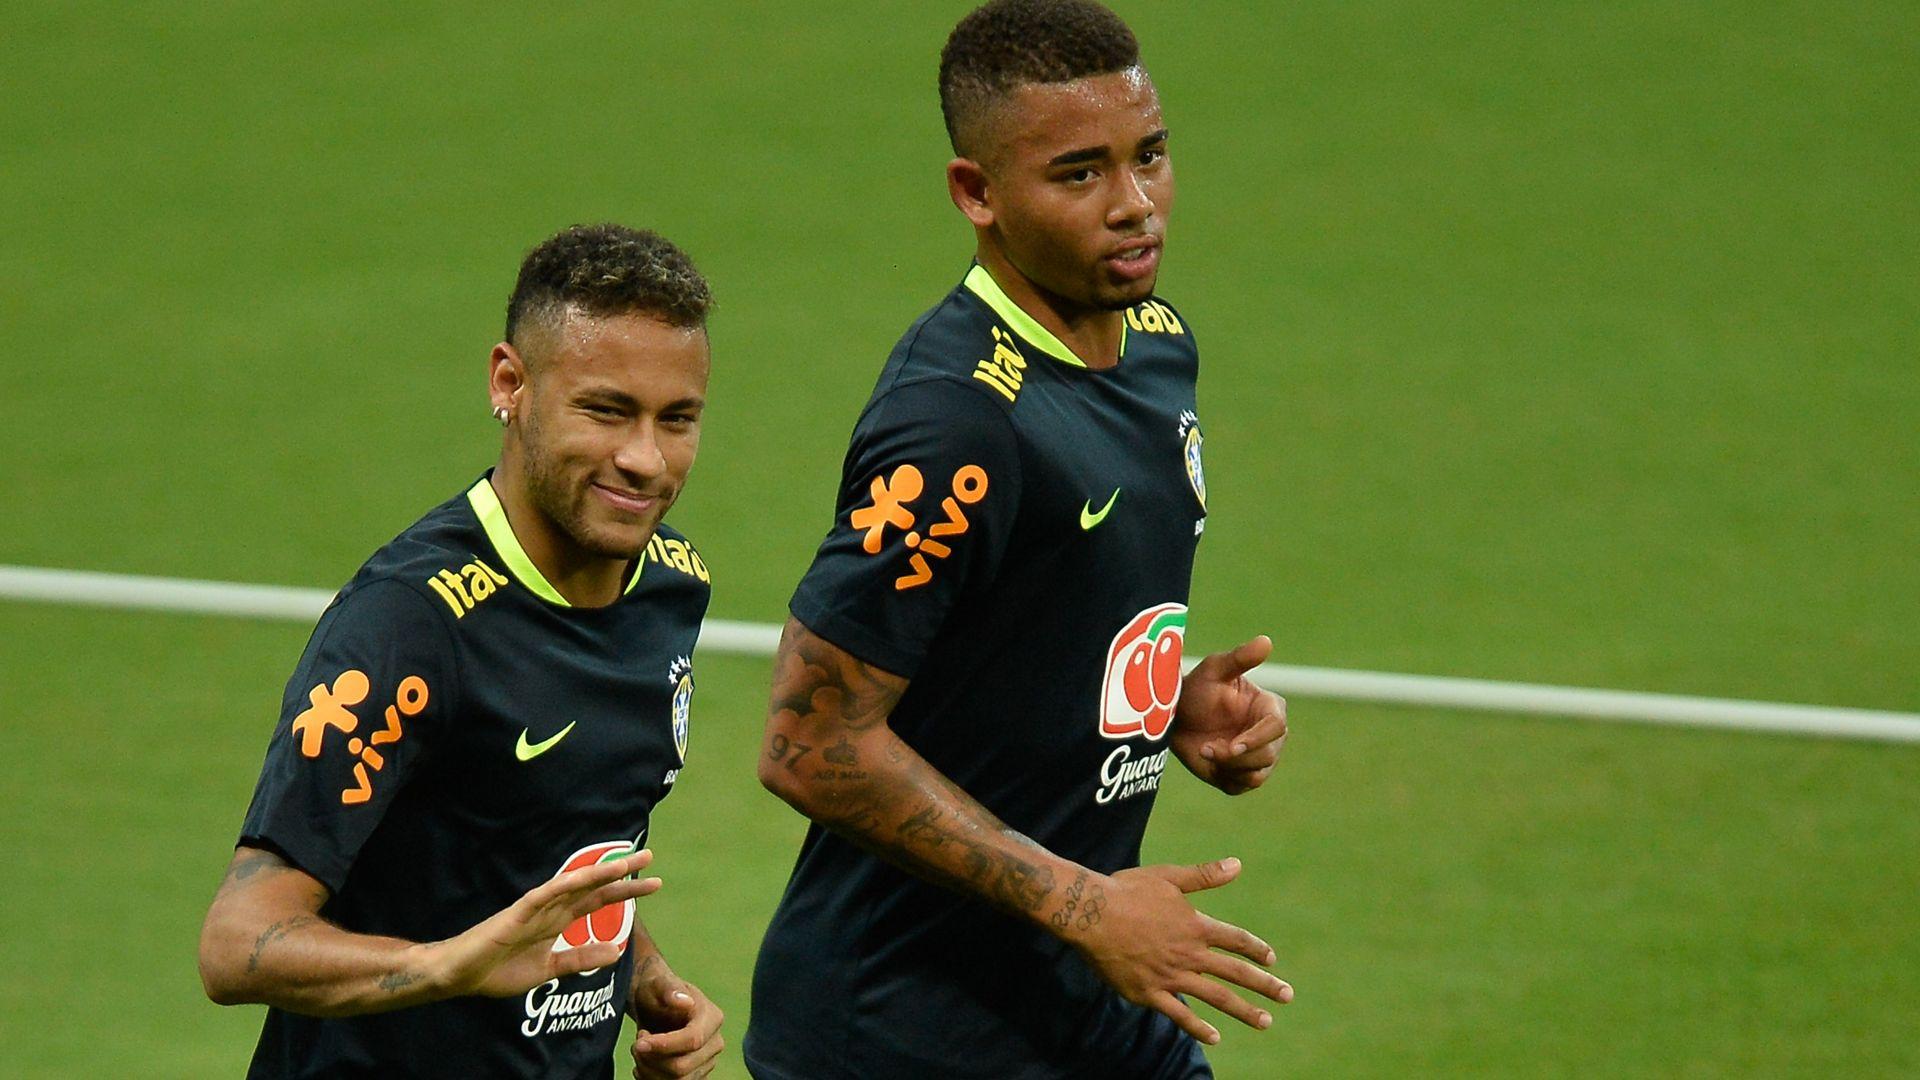 Tite recorre a reservas contra a Colômbia